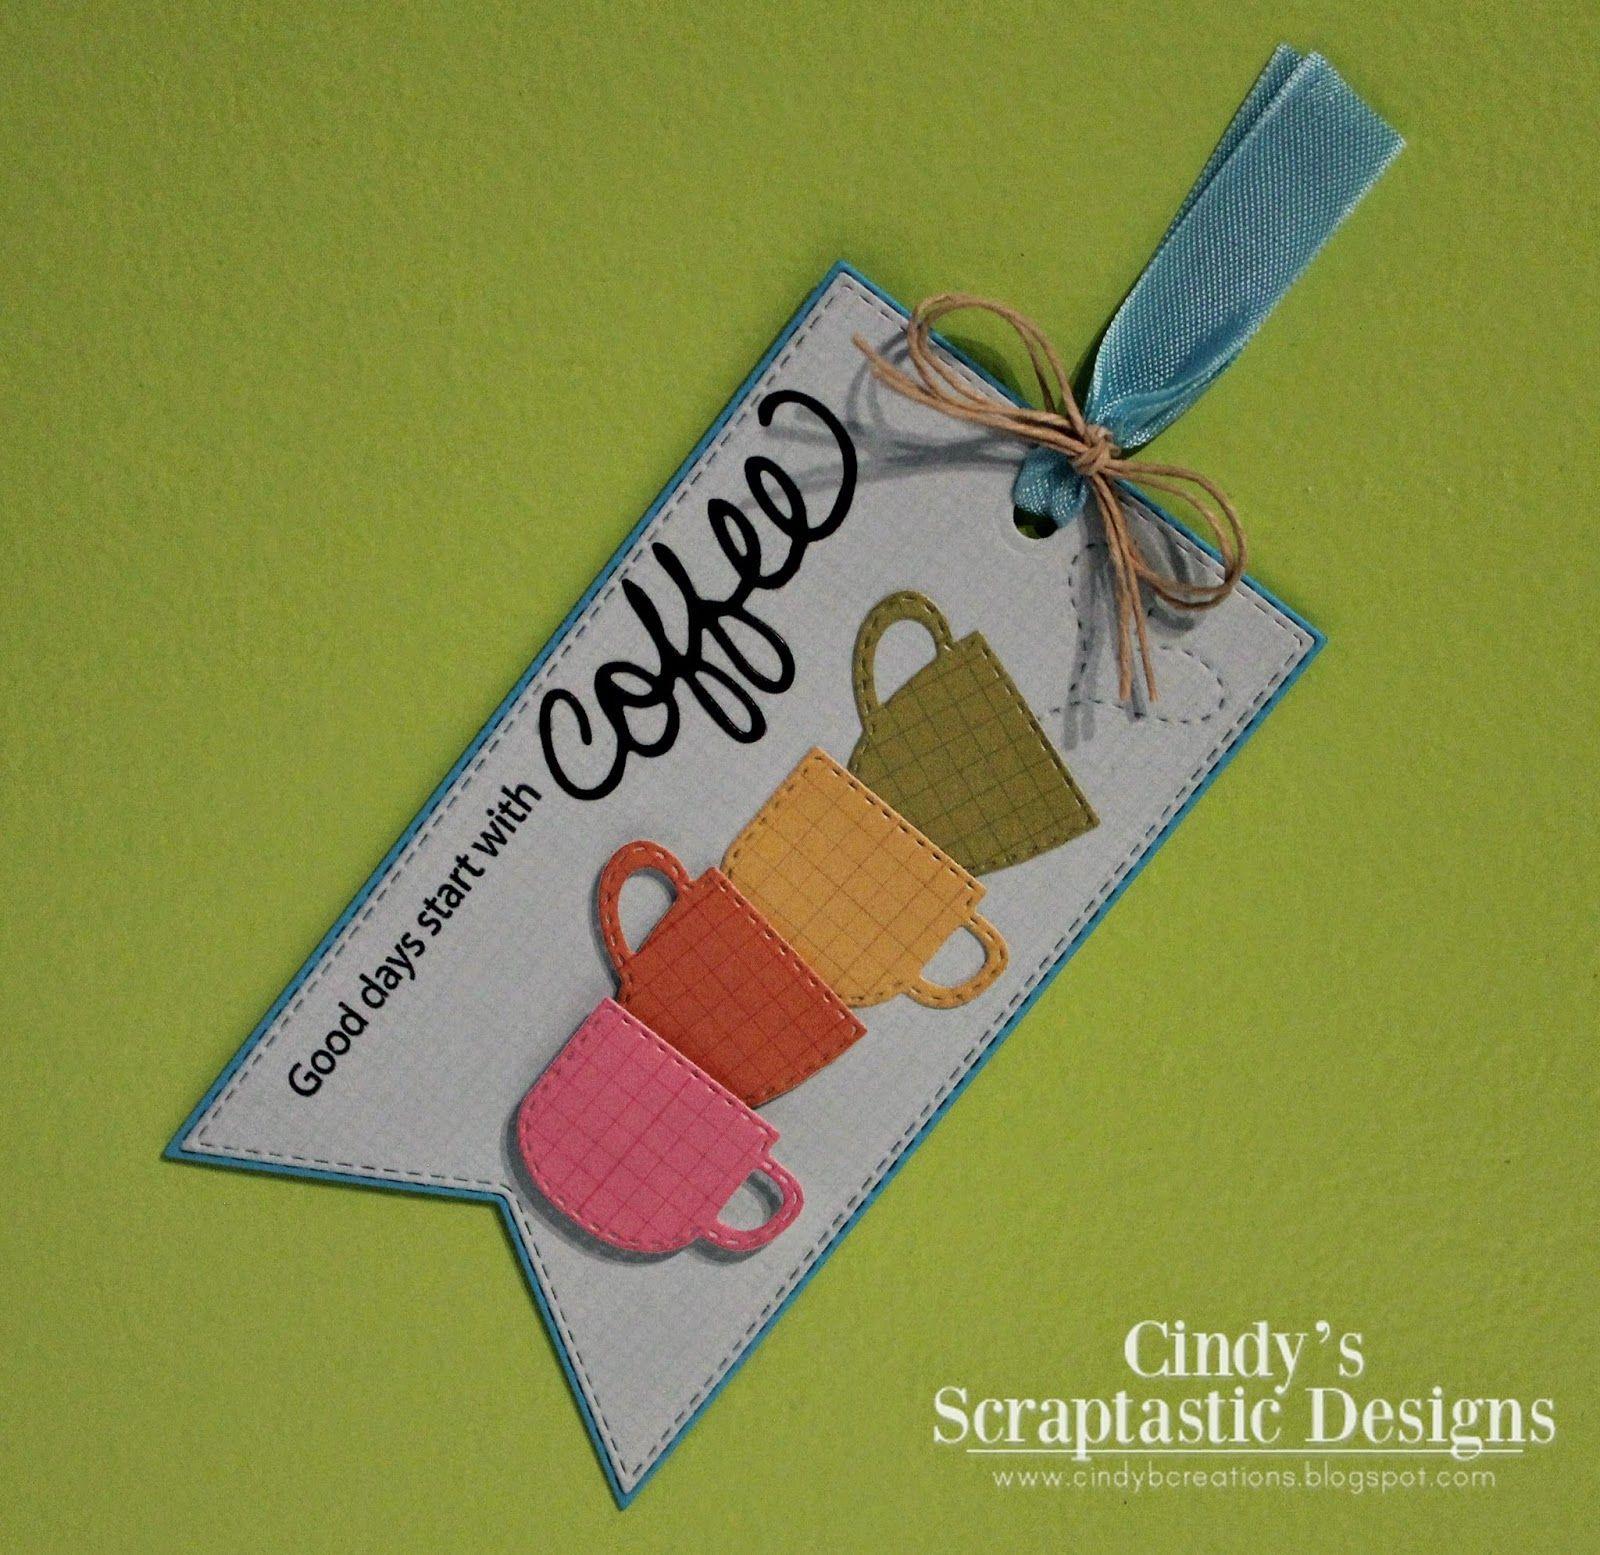 Cindy's Scraptastic Designs